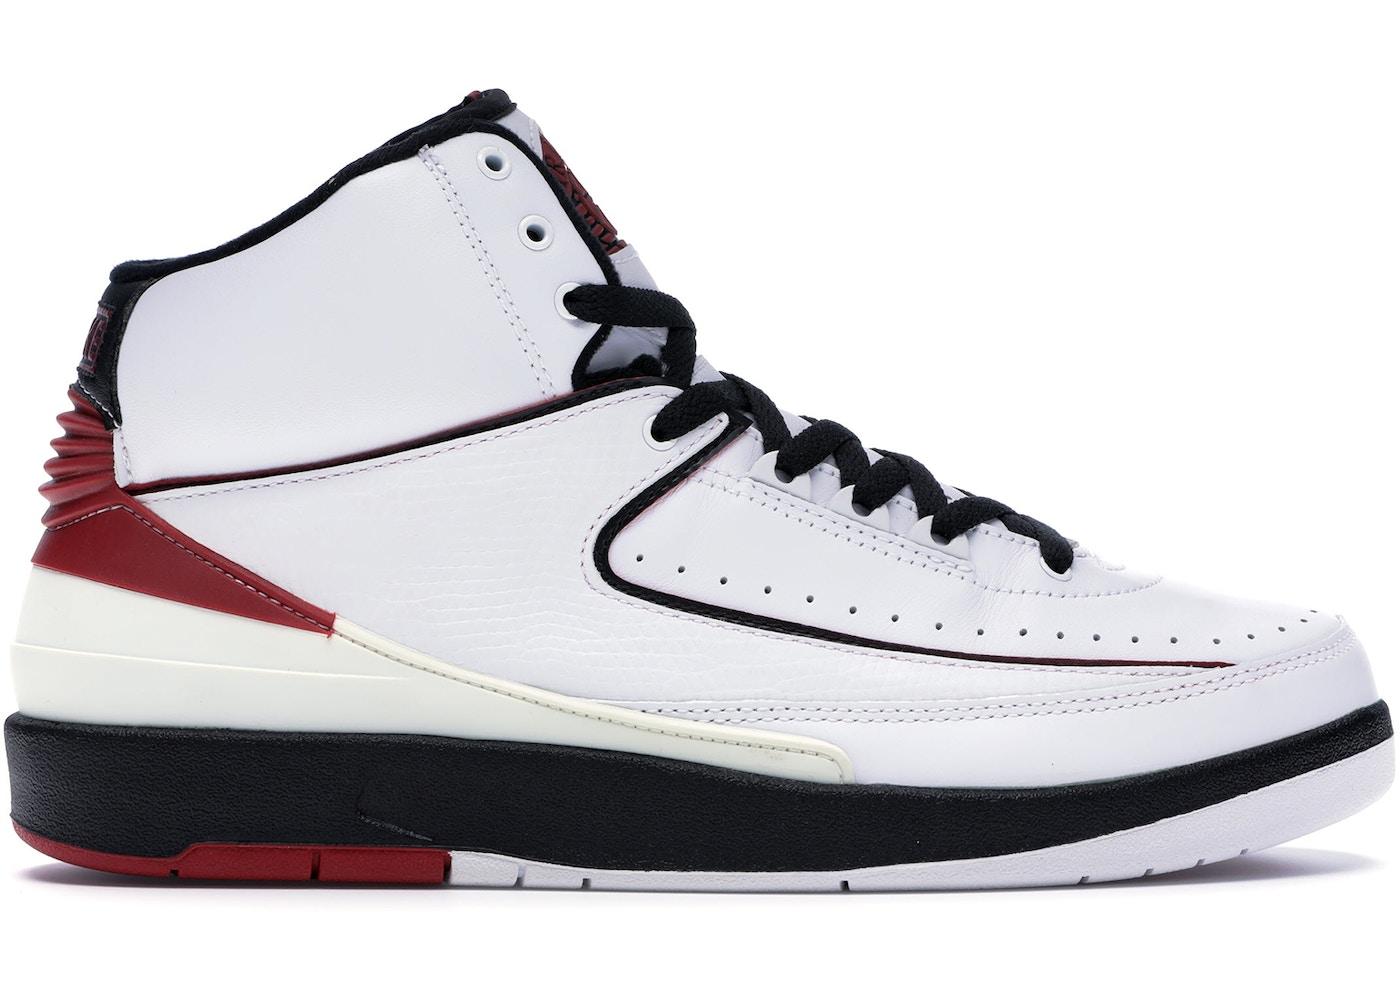 check out 08263 f53dc Jordan 2 Retro White Varsity Red (2004) - 308308-161